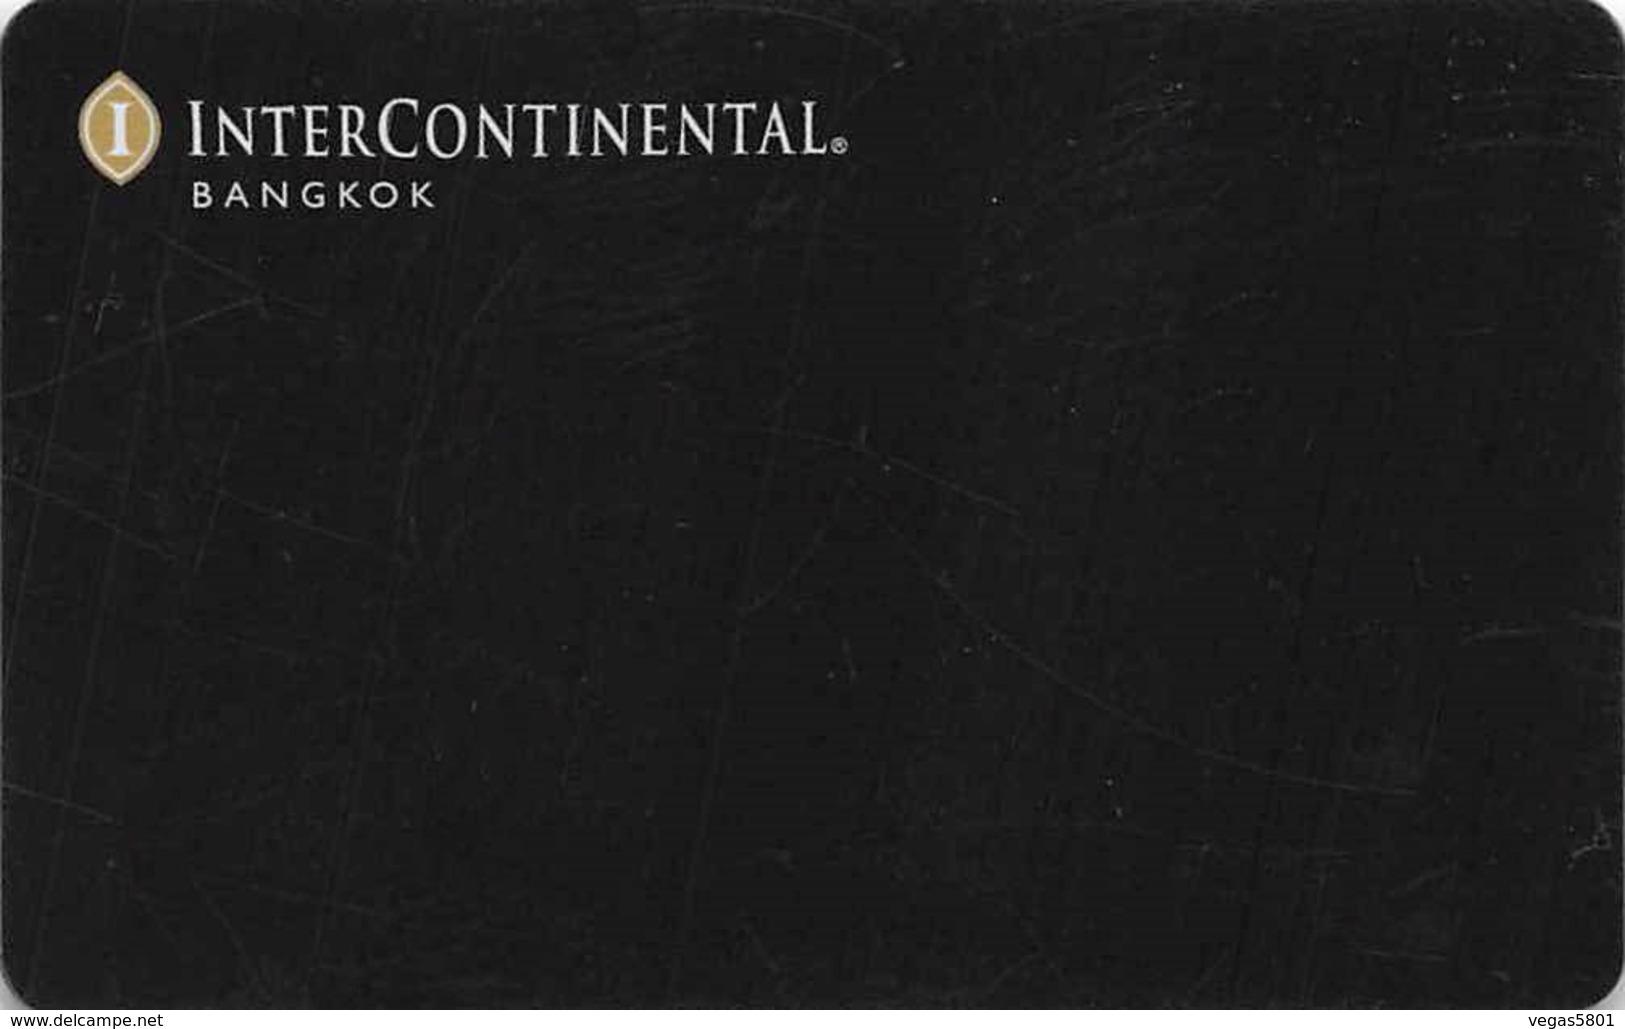 INTERCONTINENTAL - Bangkok - Hotel Room Key Card, Hotelkarte, Schlüsselkarte, Clé De L'Hôtel - Hotelkarten